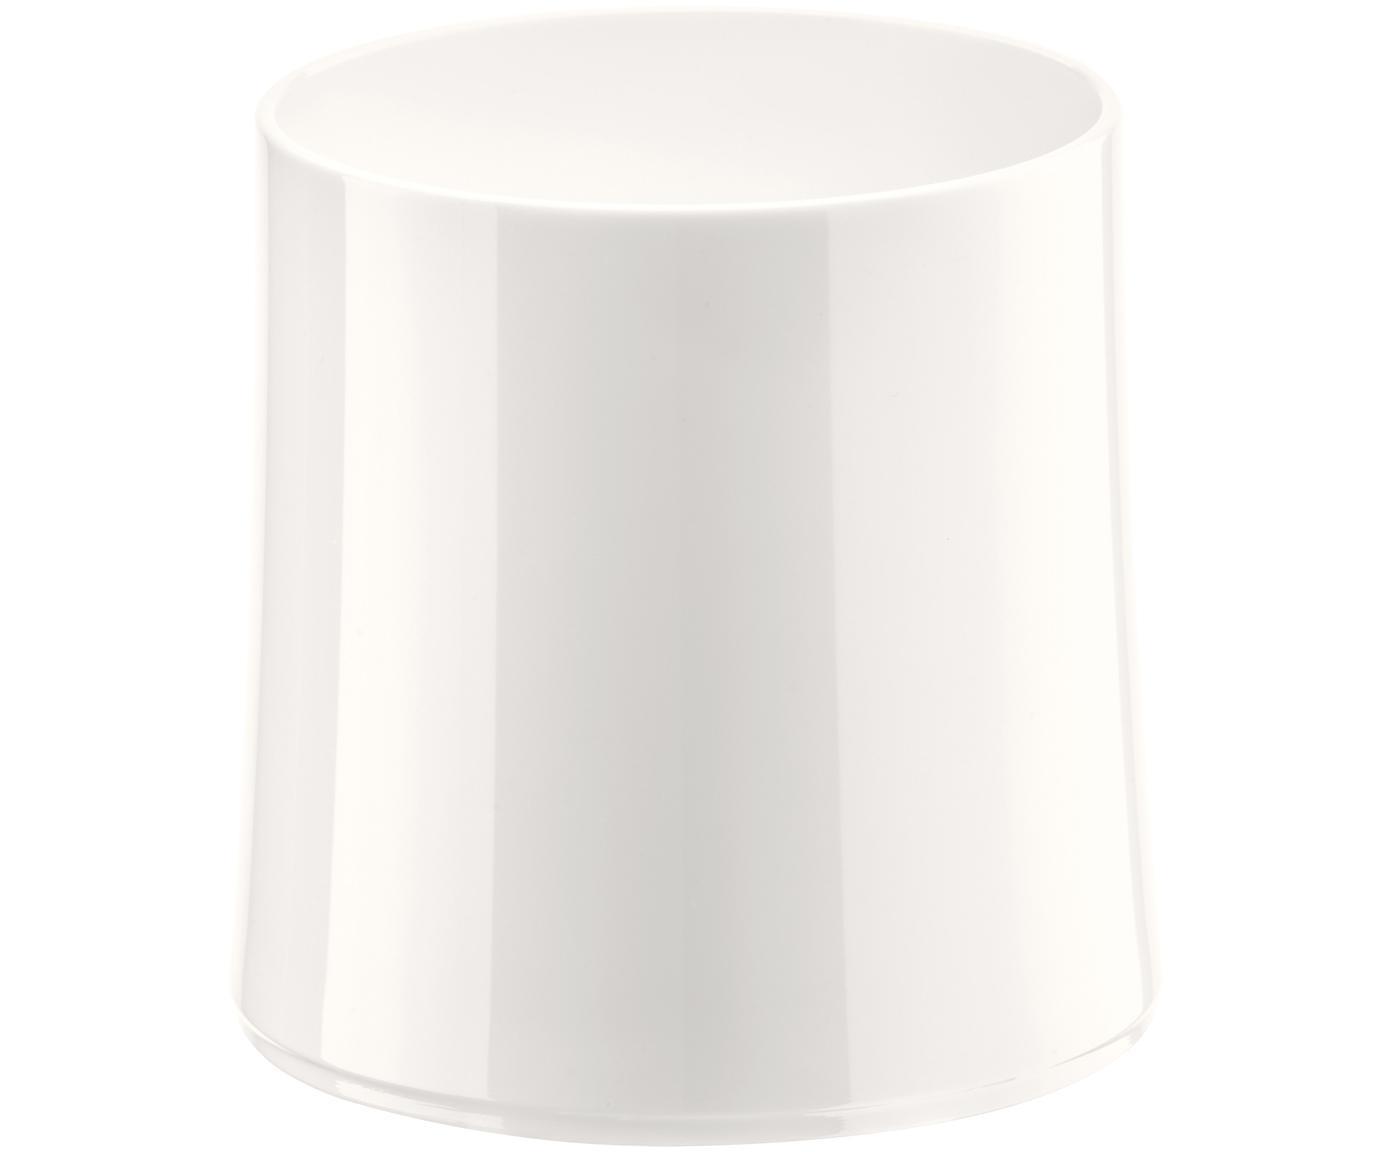 Bicchieri per l'acqua in materiale sintetico infrangibile Cheers, Materiale sintetico termoplastico (Superglass), Bianco lucido, Ø 9 x Alt. 9 cm